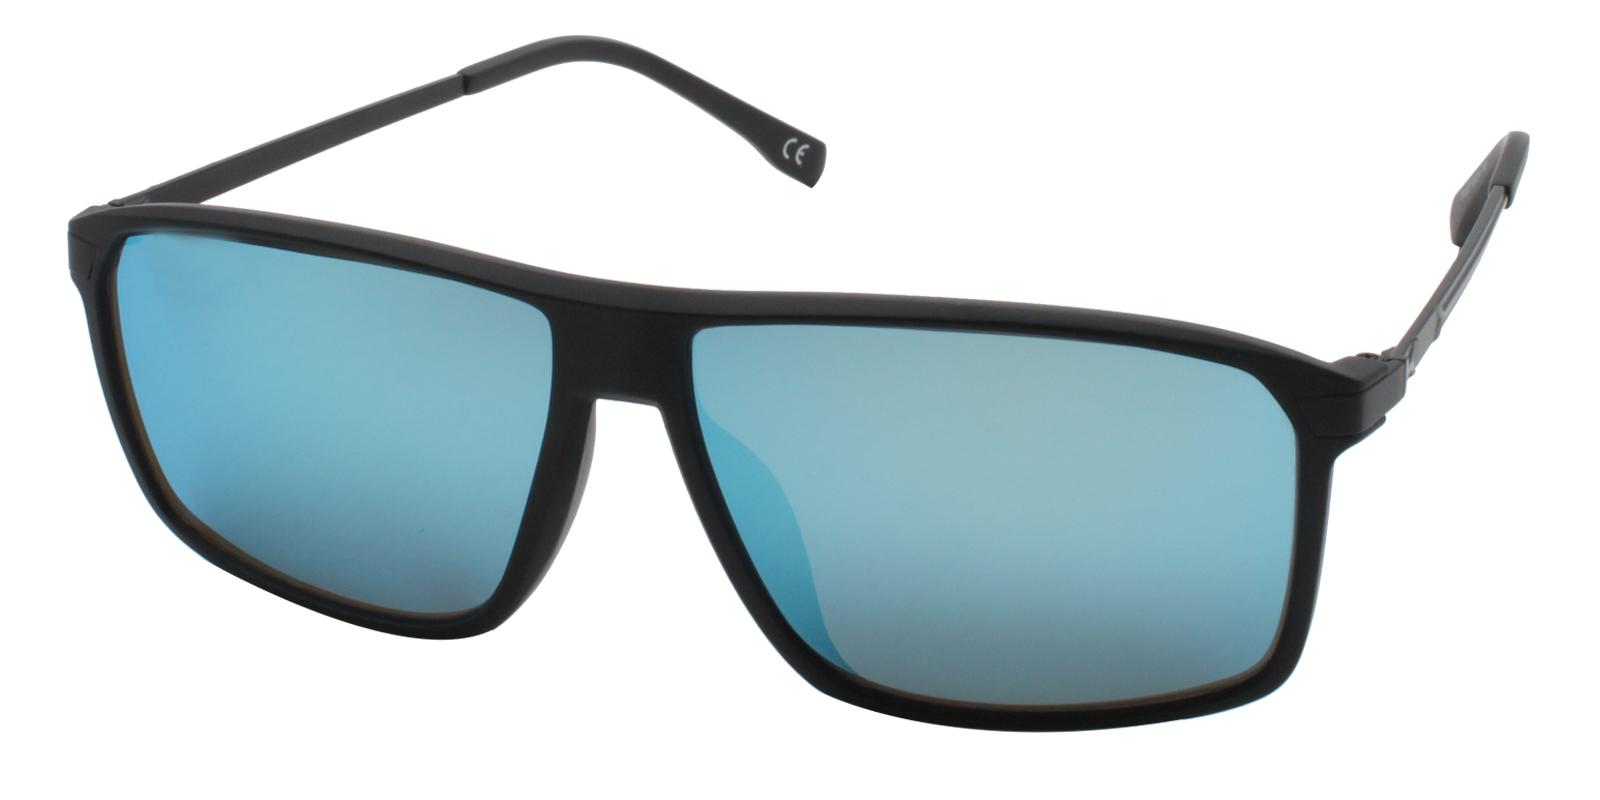 Burundi Black TR Sunglasses , UniversalBridgeFit Frames from ABBE Glasses